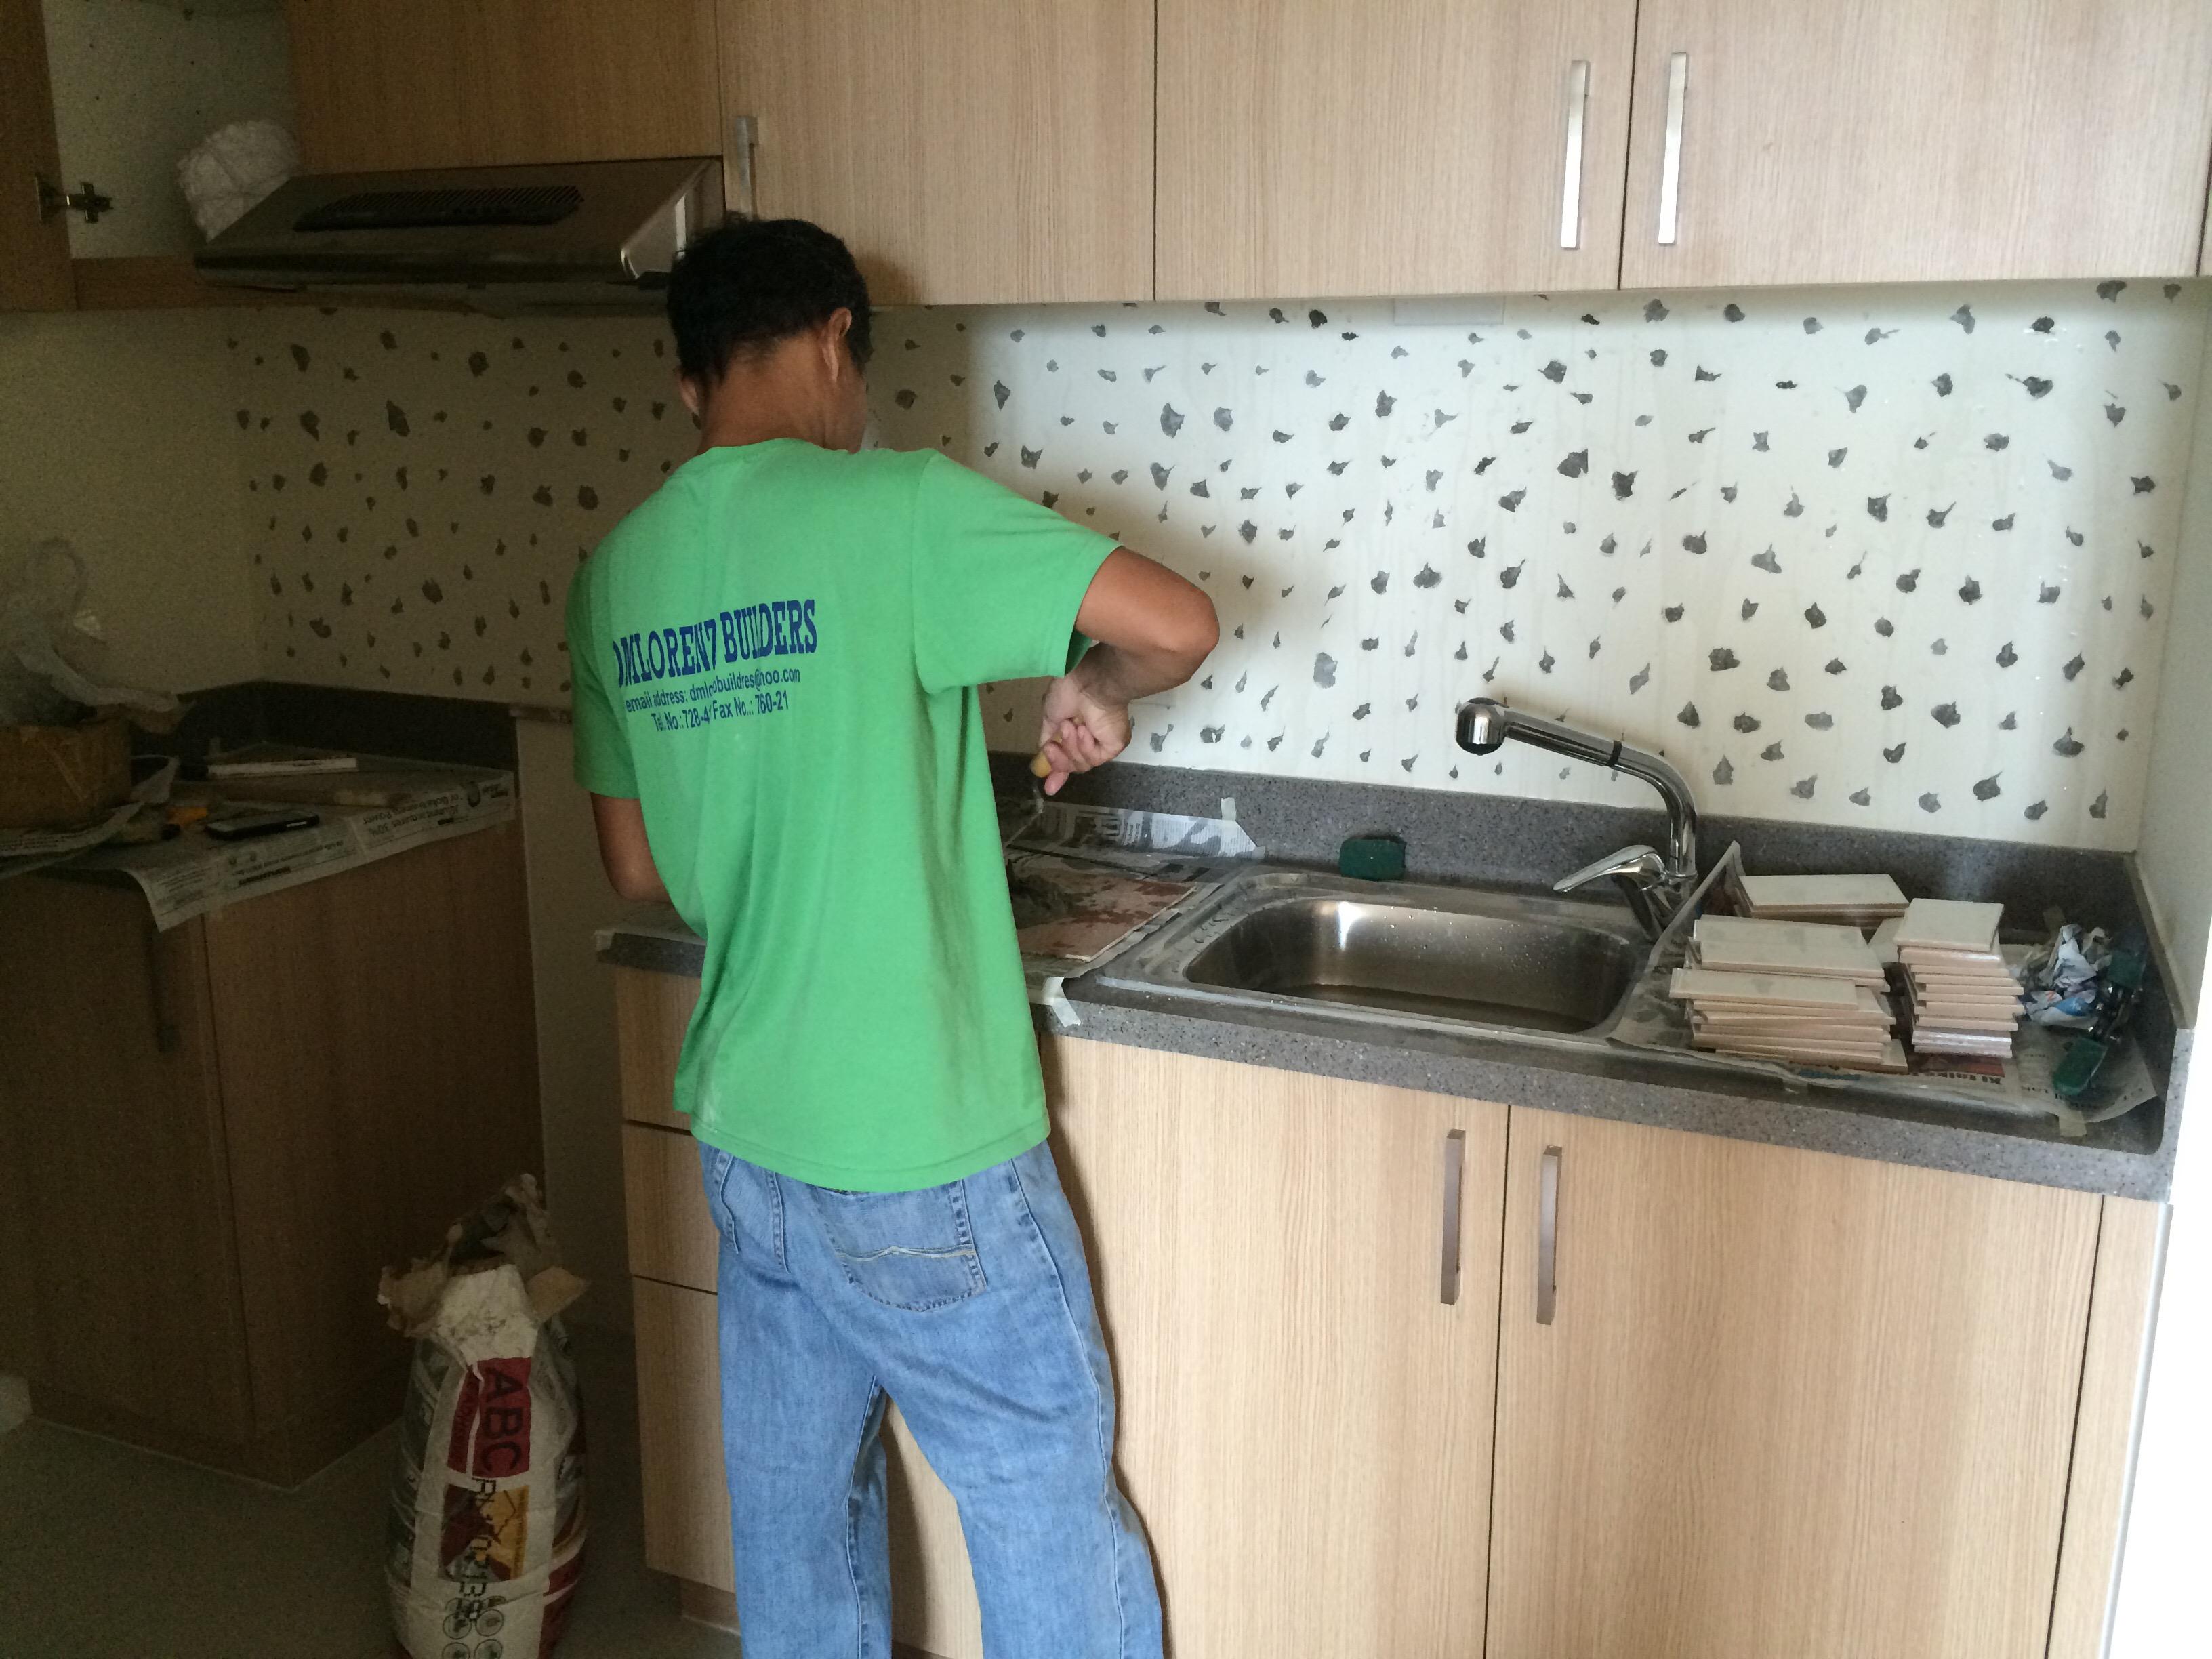 renovation, condo, interior design, backsplash, kitchen